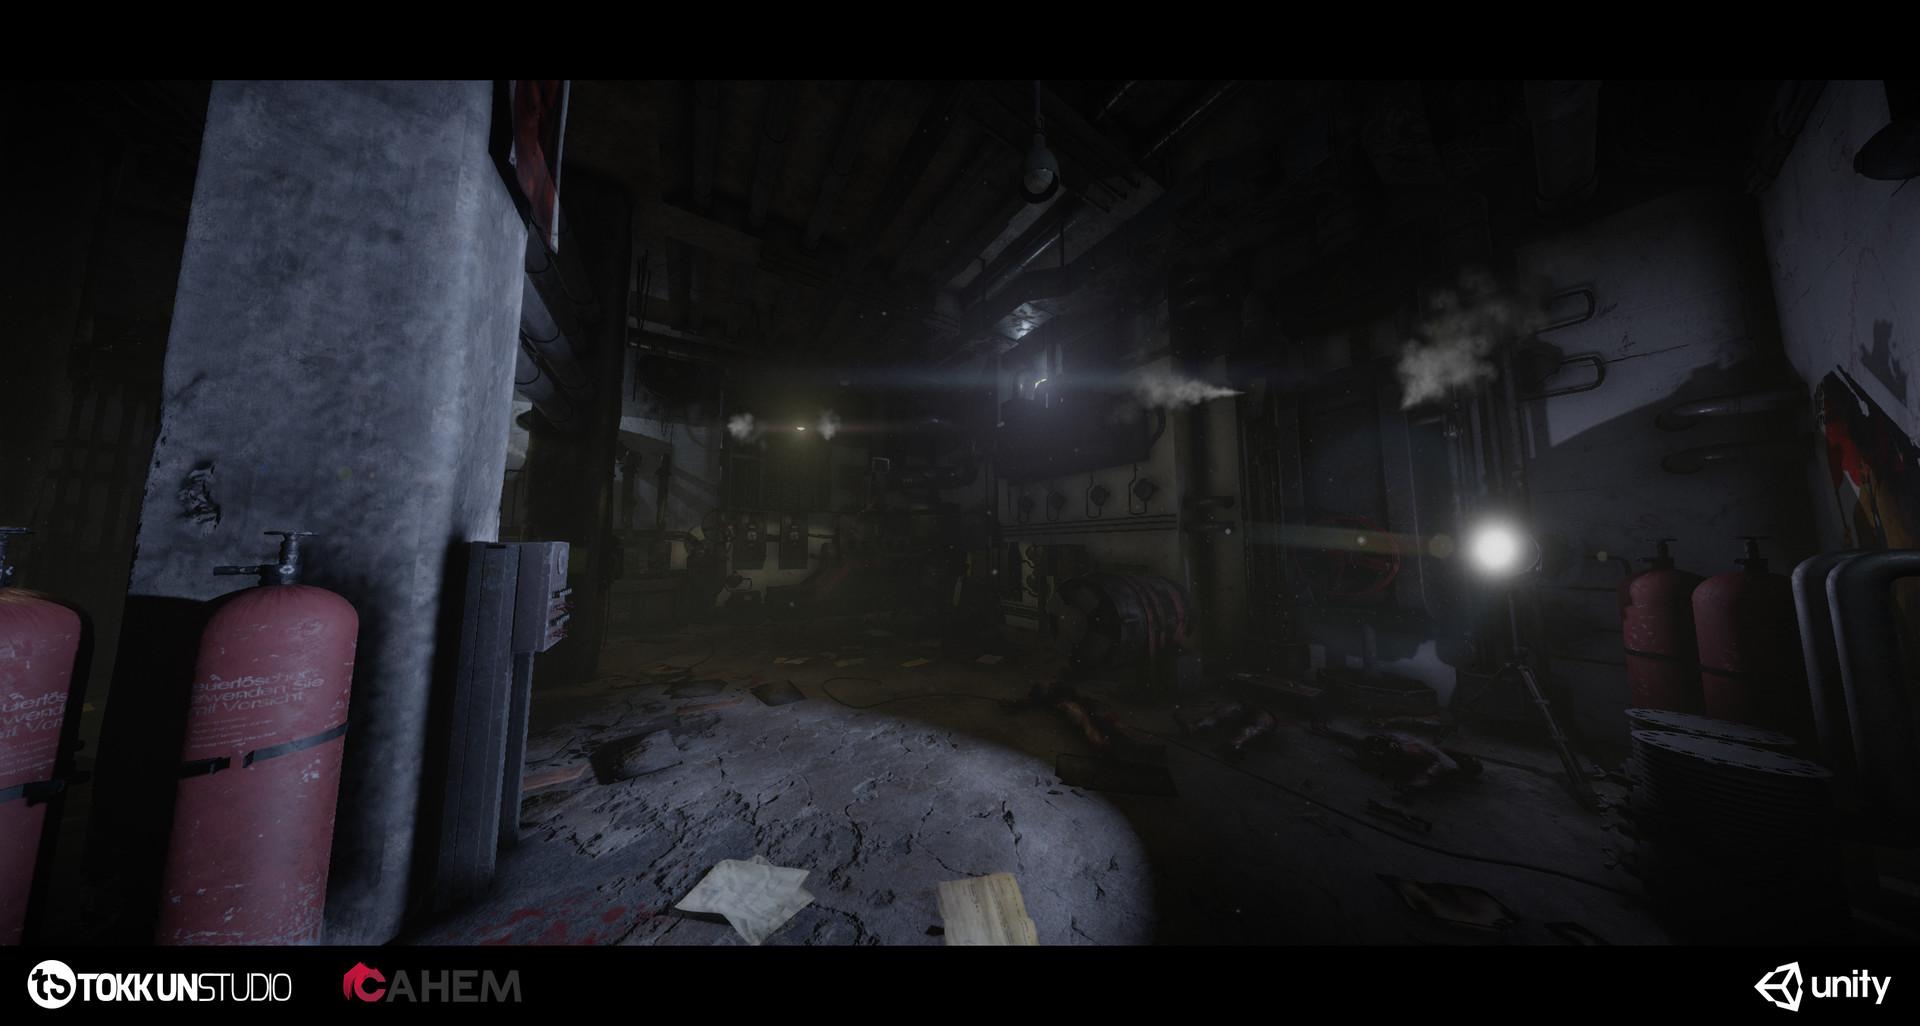 Tokkun studio bunker shot 16